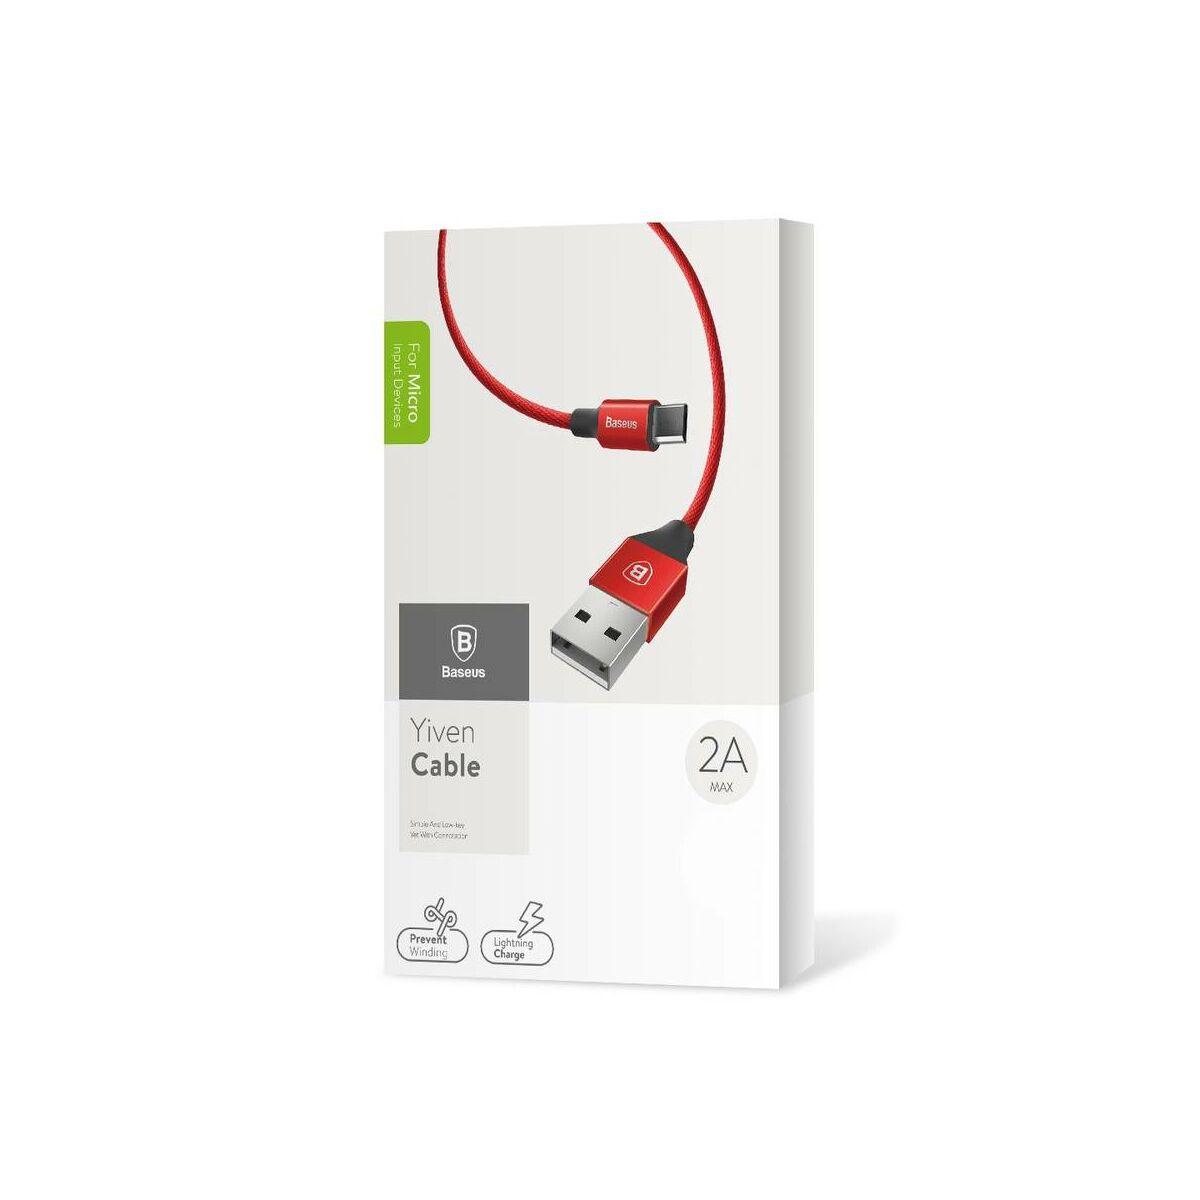 Baseus Micro USB kábel, Yiven kábel, 2A, 1.5m, piros (CAMYW-B09)